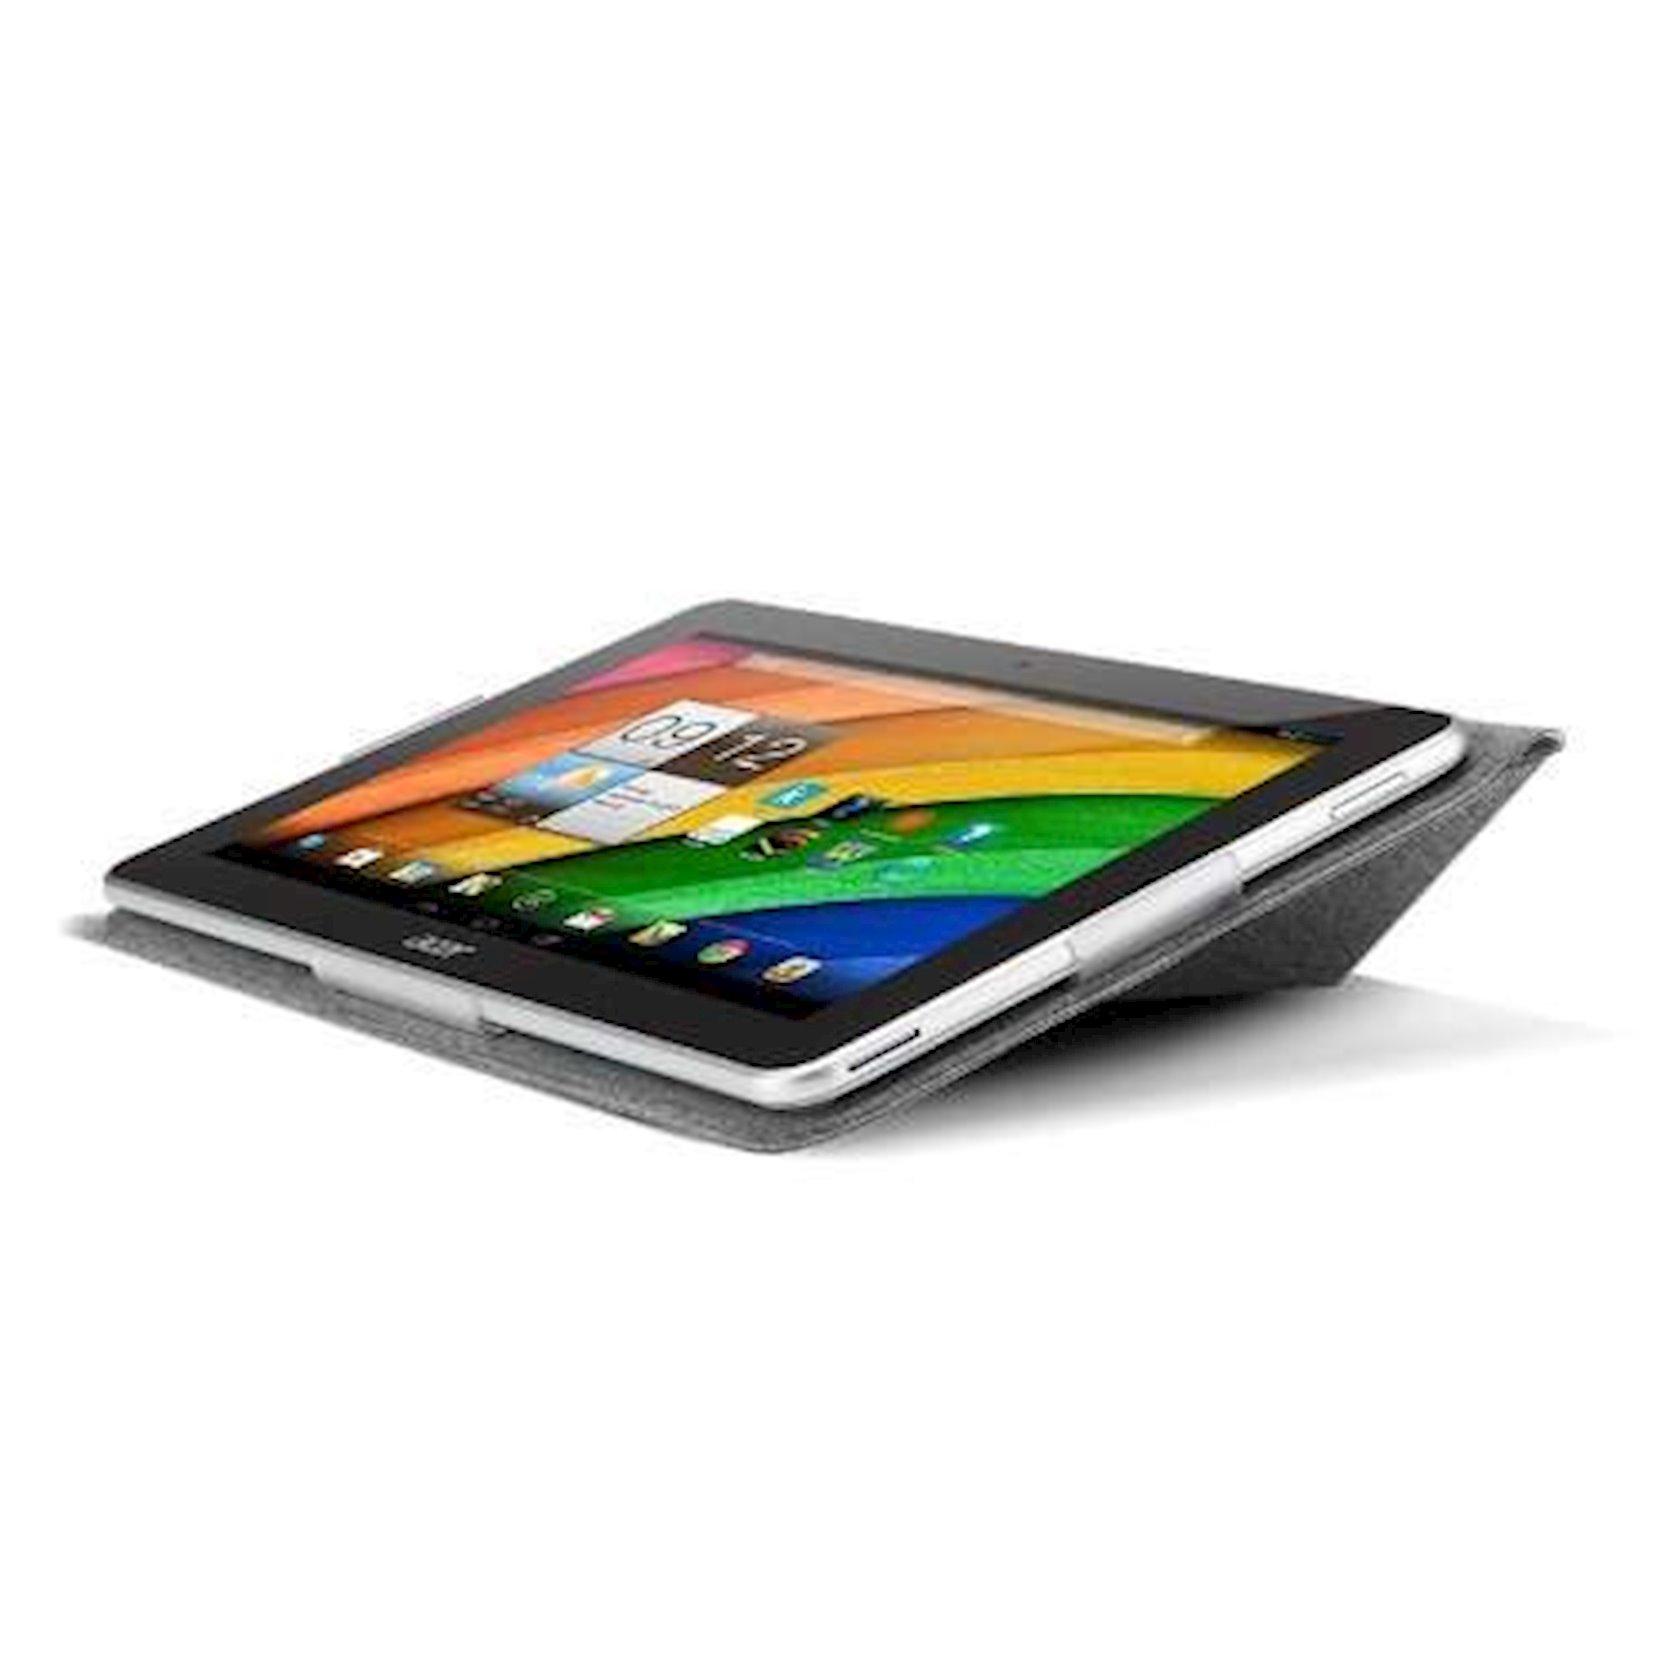 Planşet üçün çexol Acer Crunch Cover A3-A10 Ağ 25.4 sm